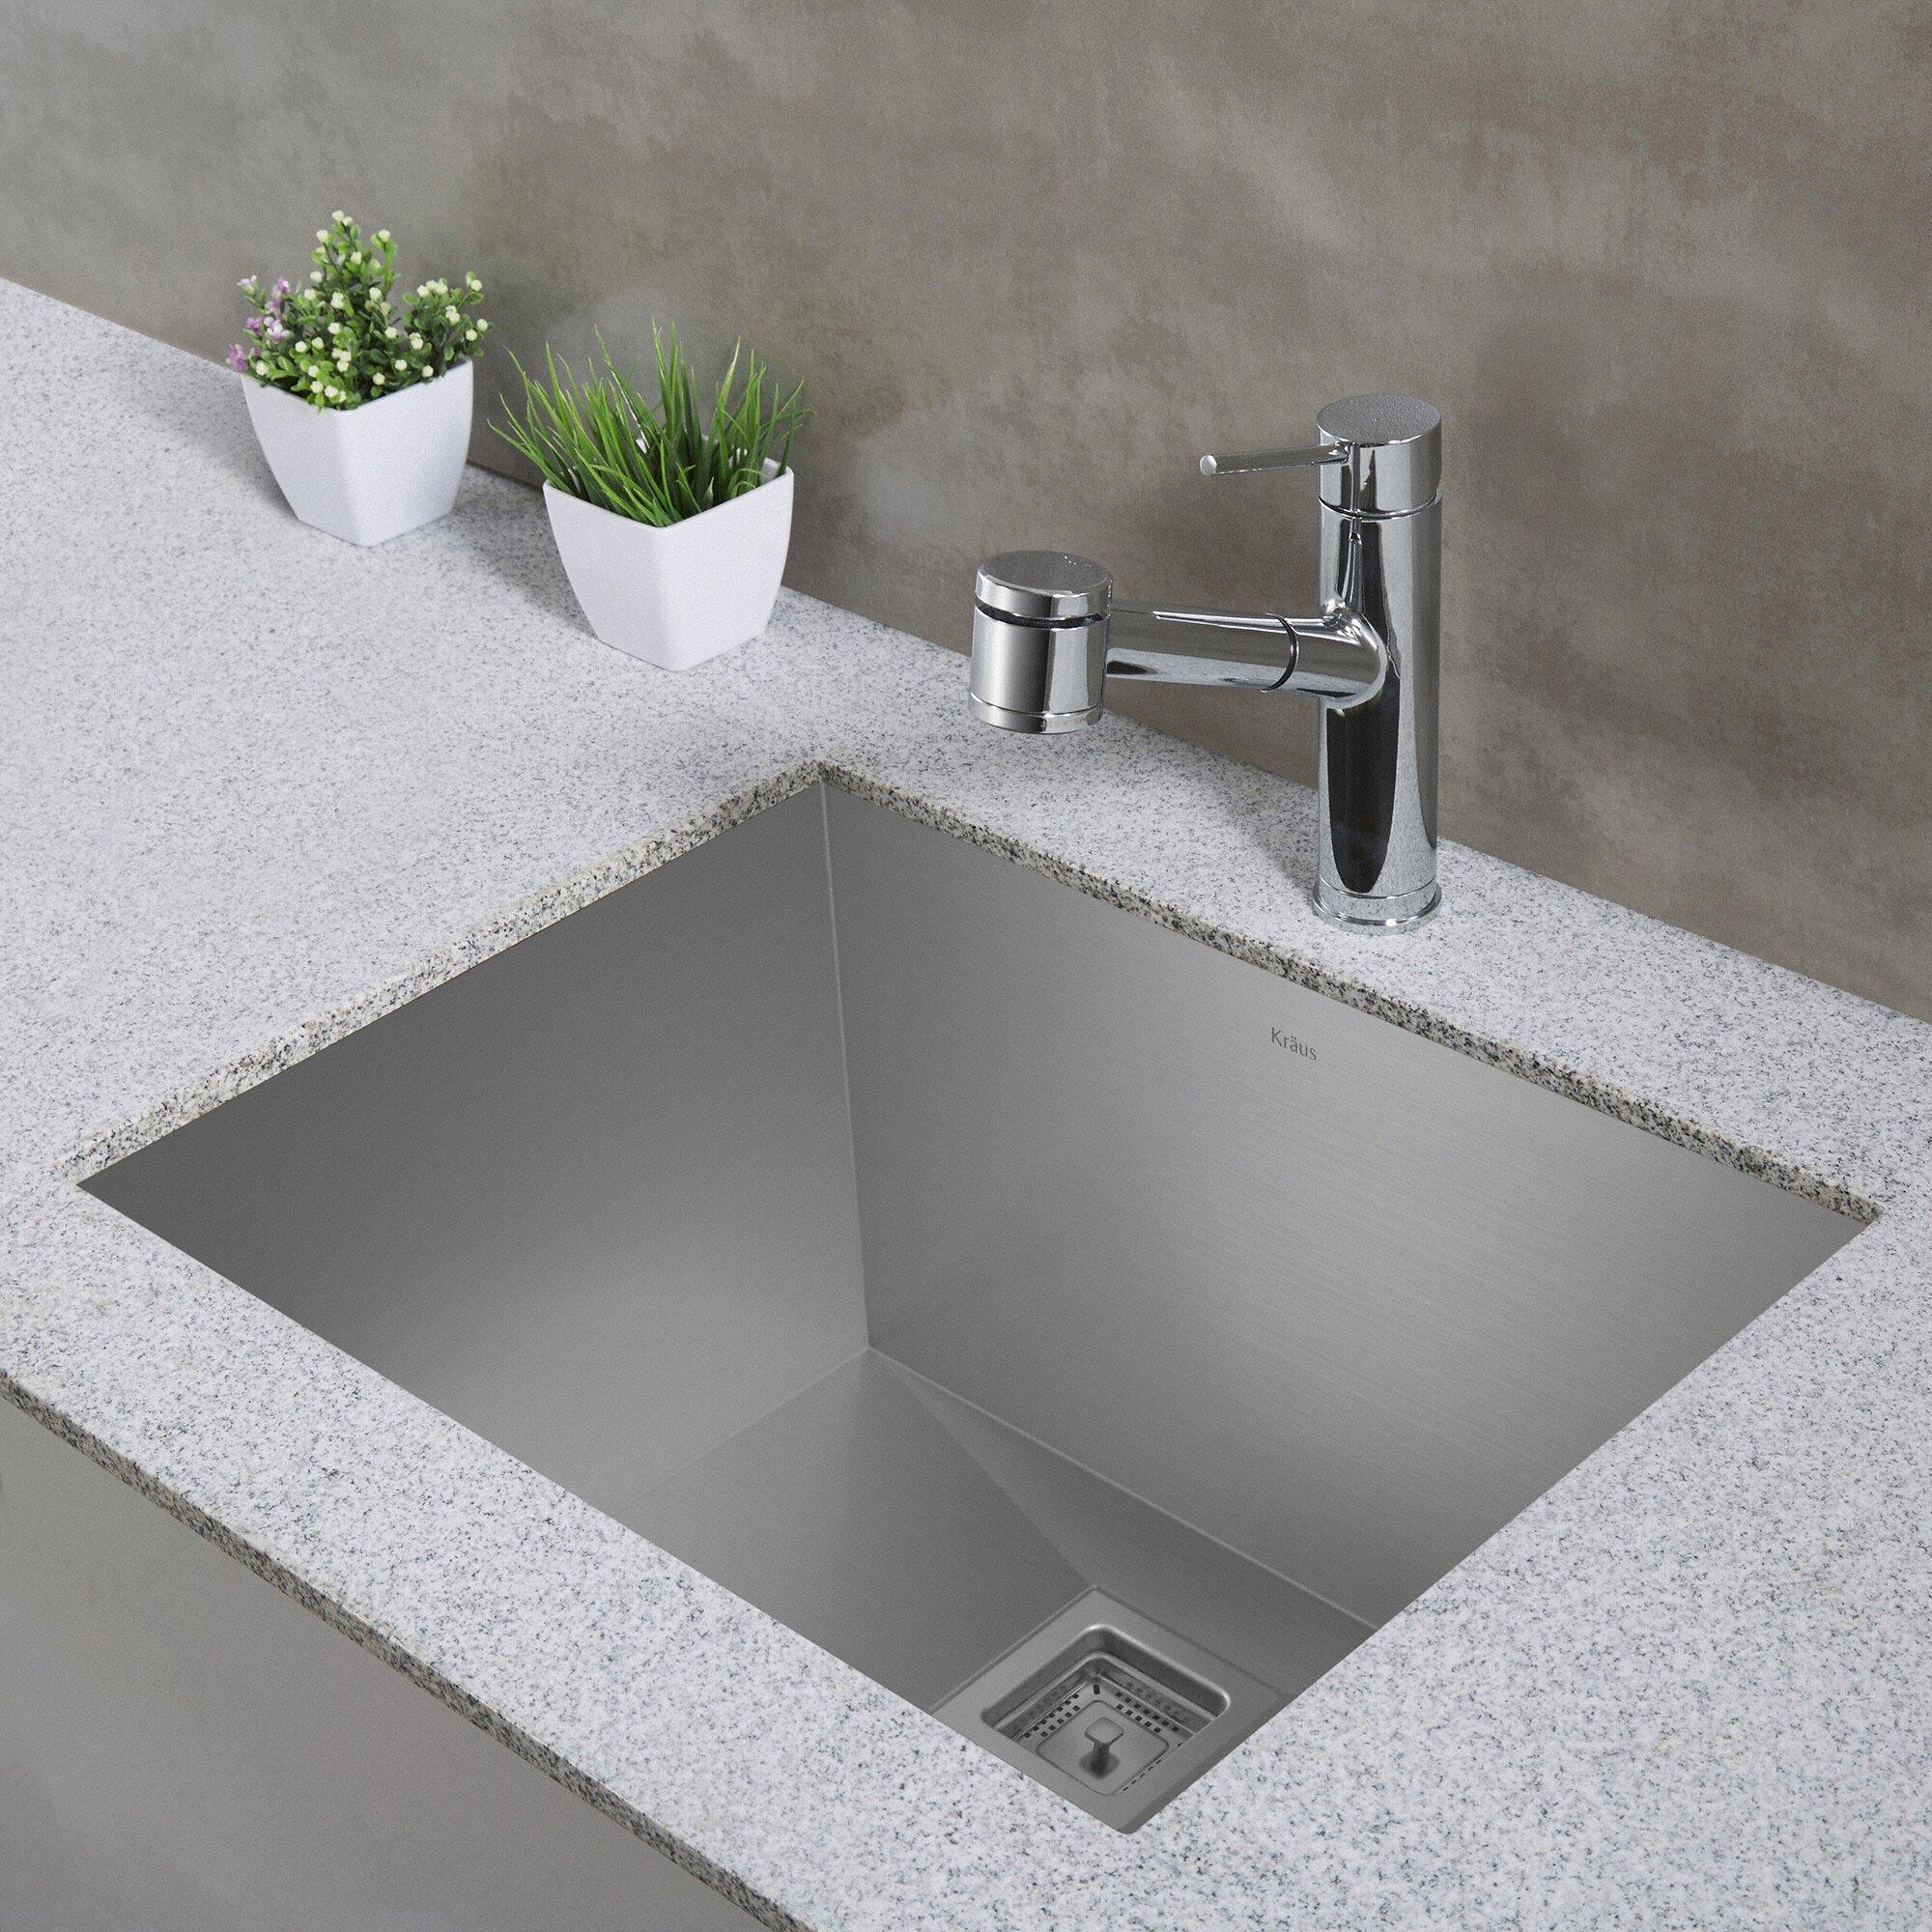 Undermount Utility Sink Laundry Befon For